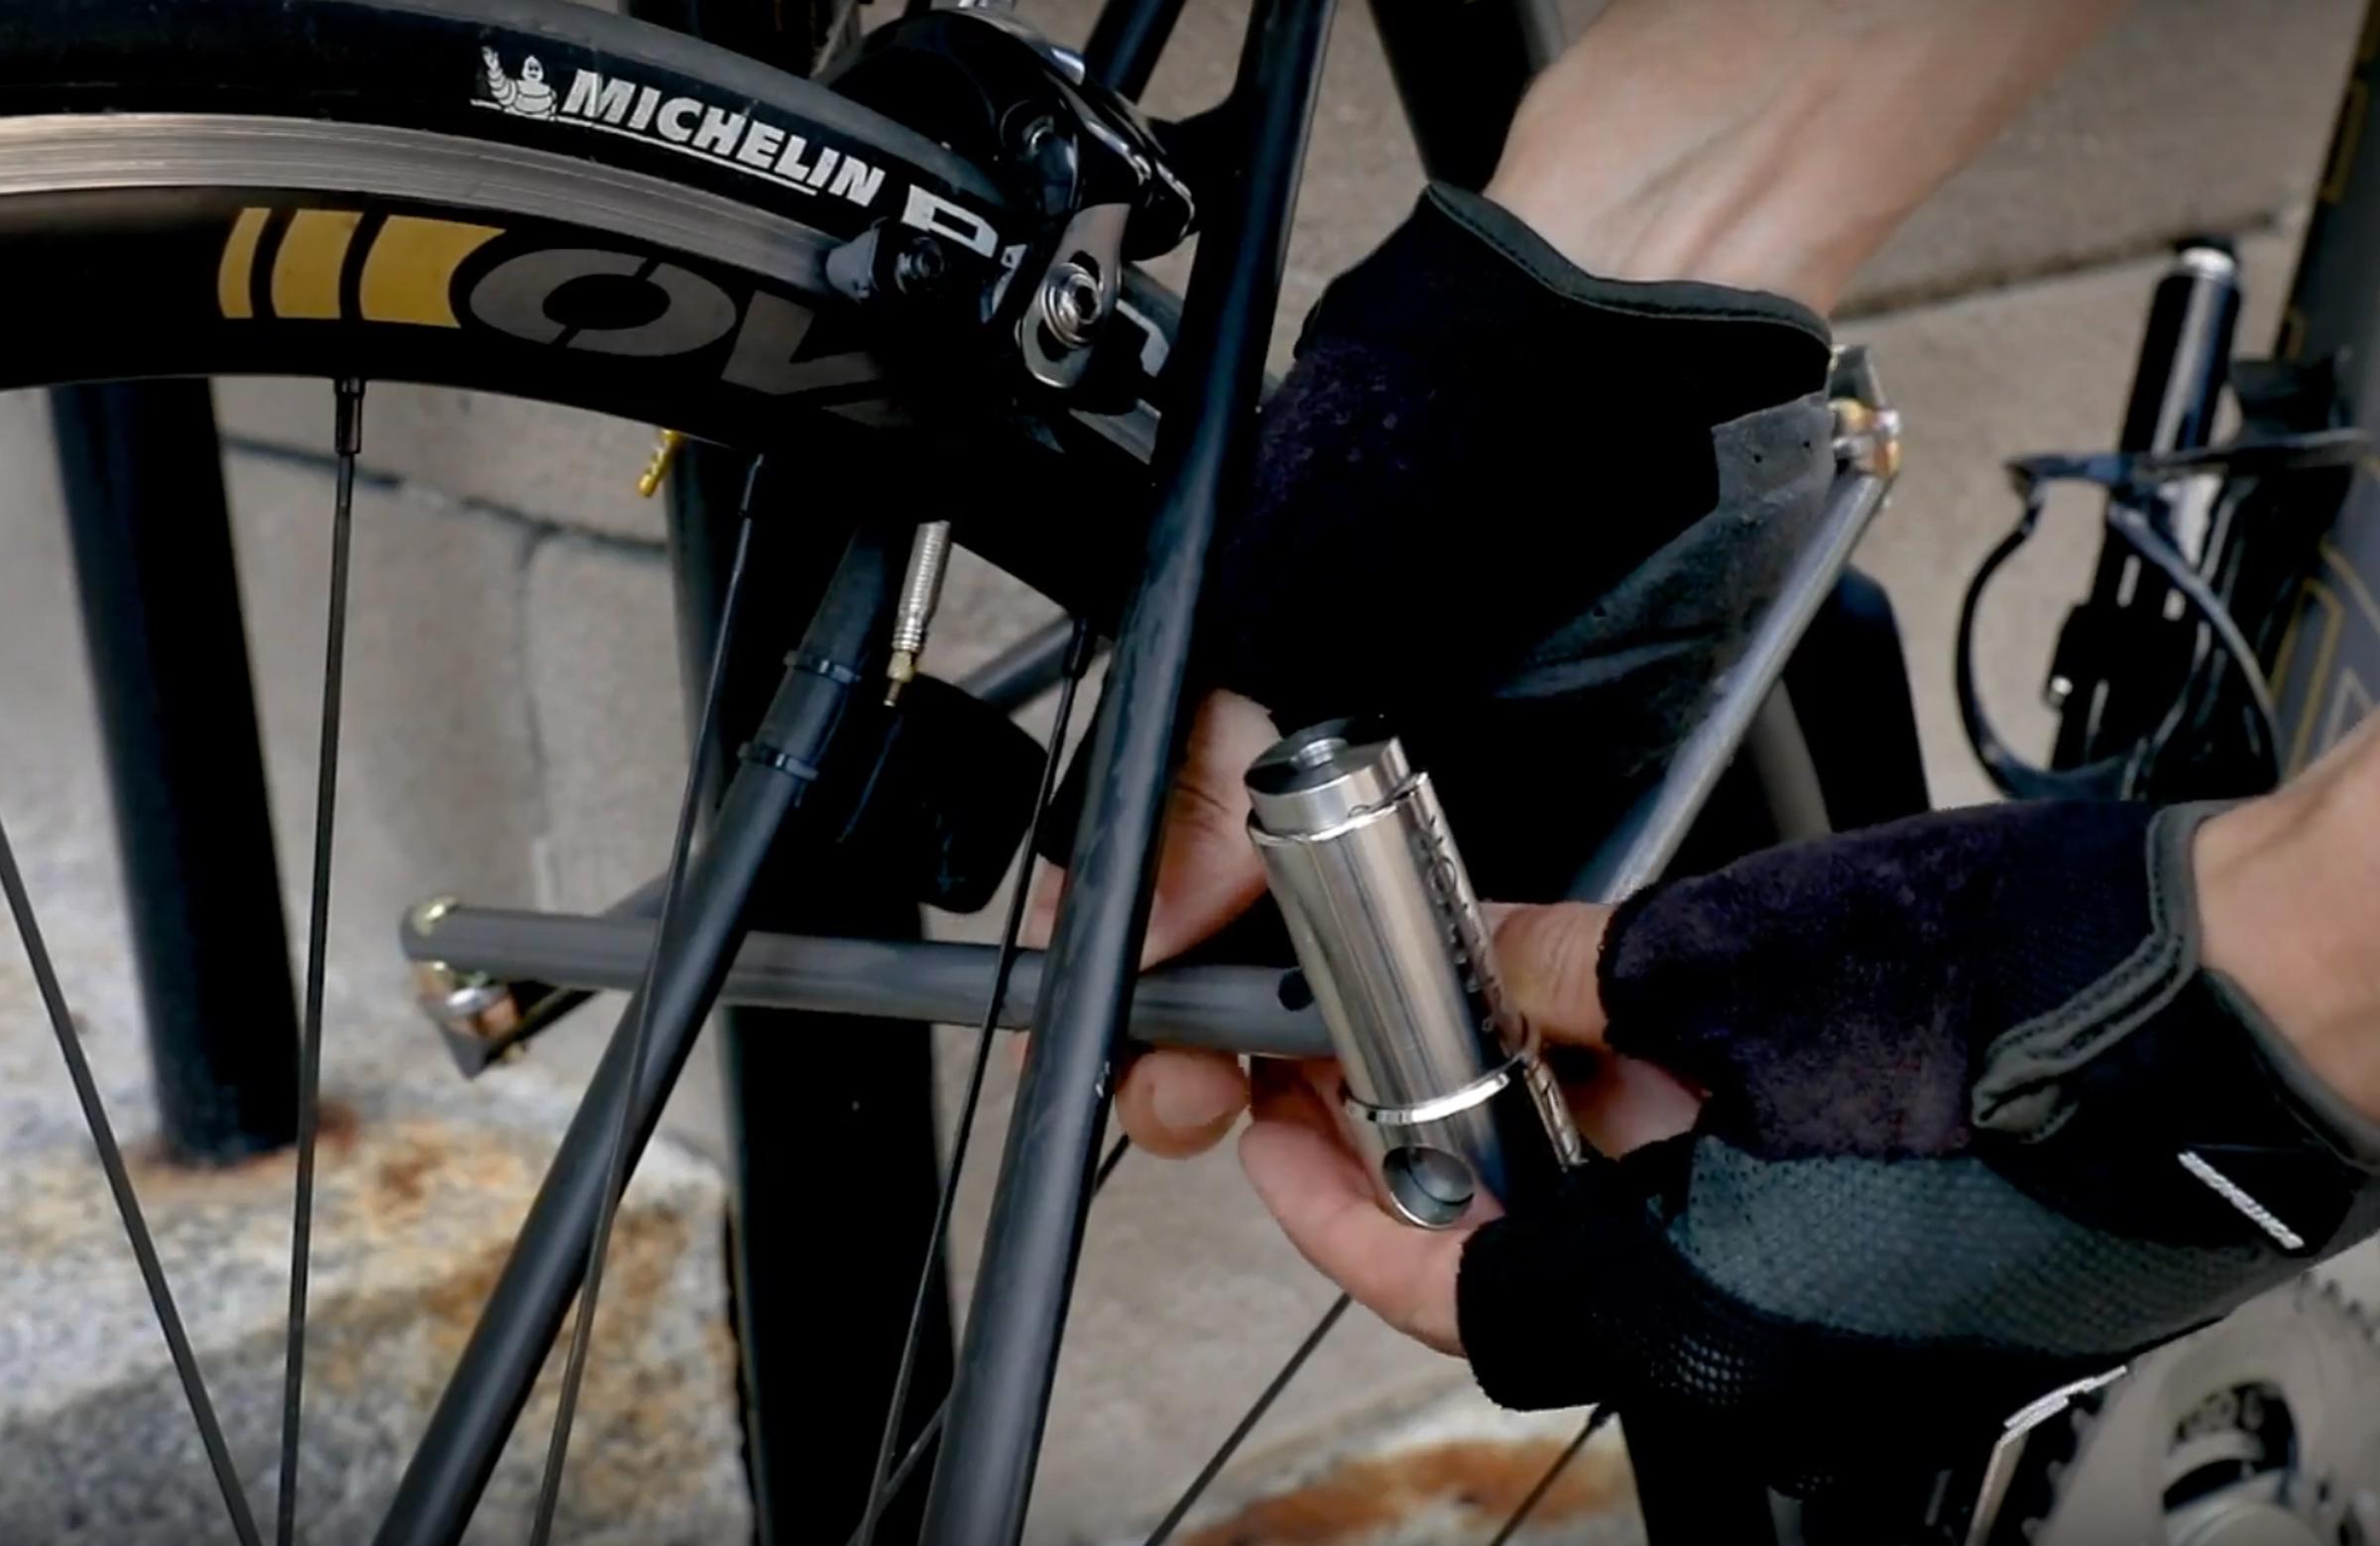 Super Light Security Thwart Thieves With Titanium Bike